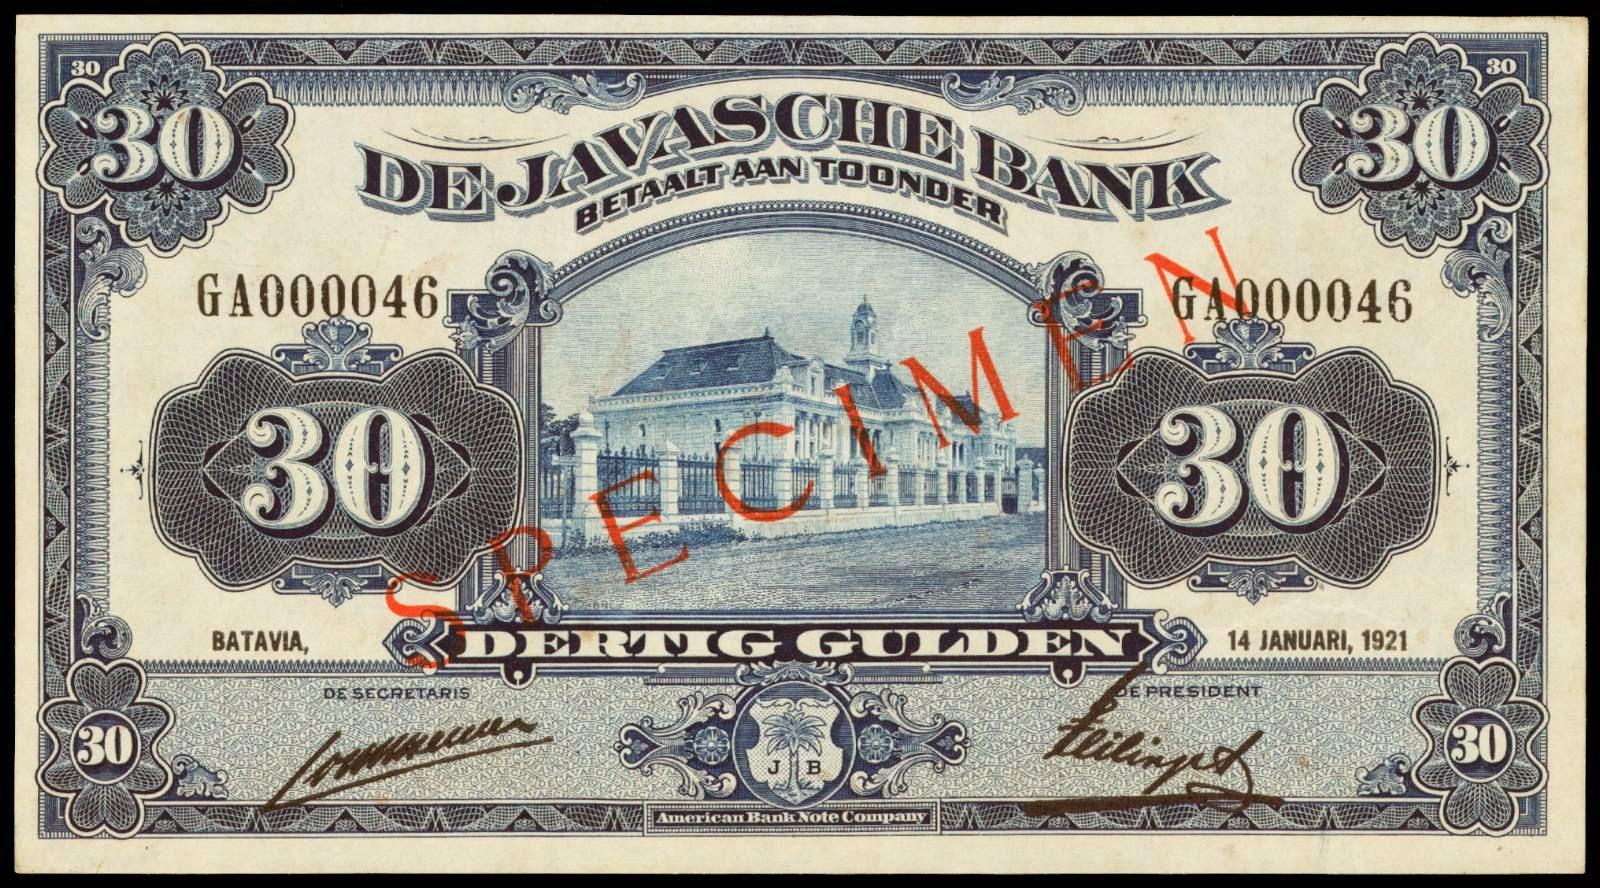 Netherlands Indies banknotes 30 Gulden note 1921 Javasche Bank